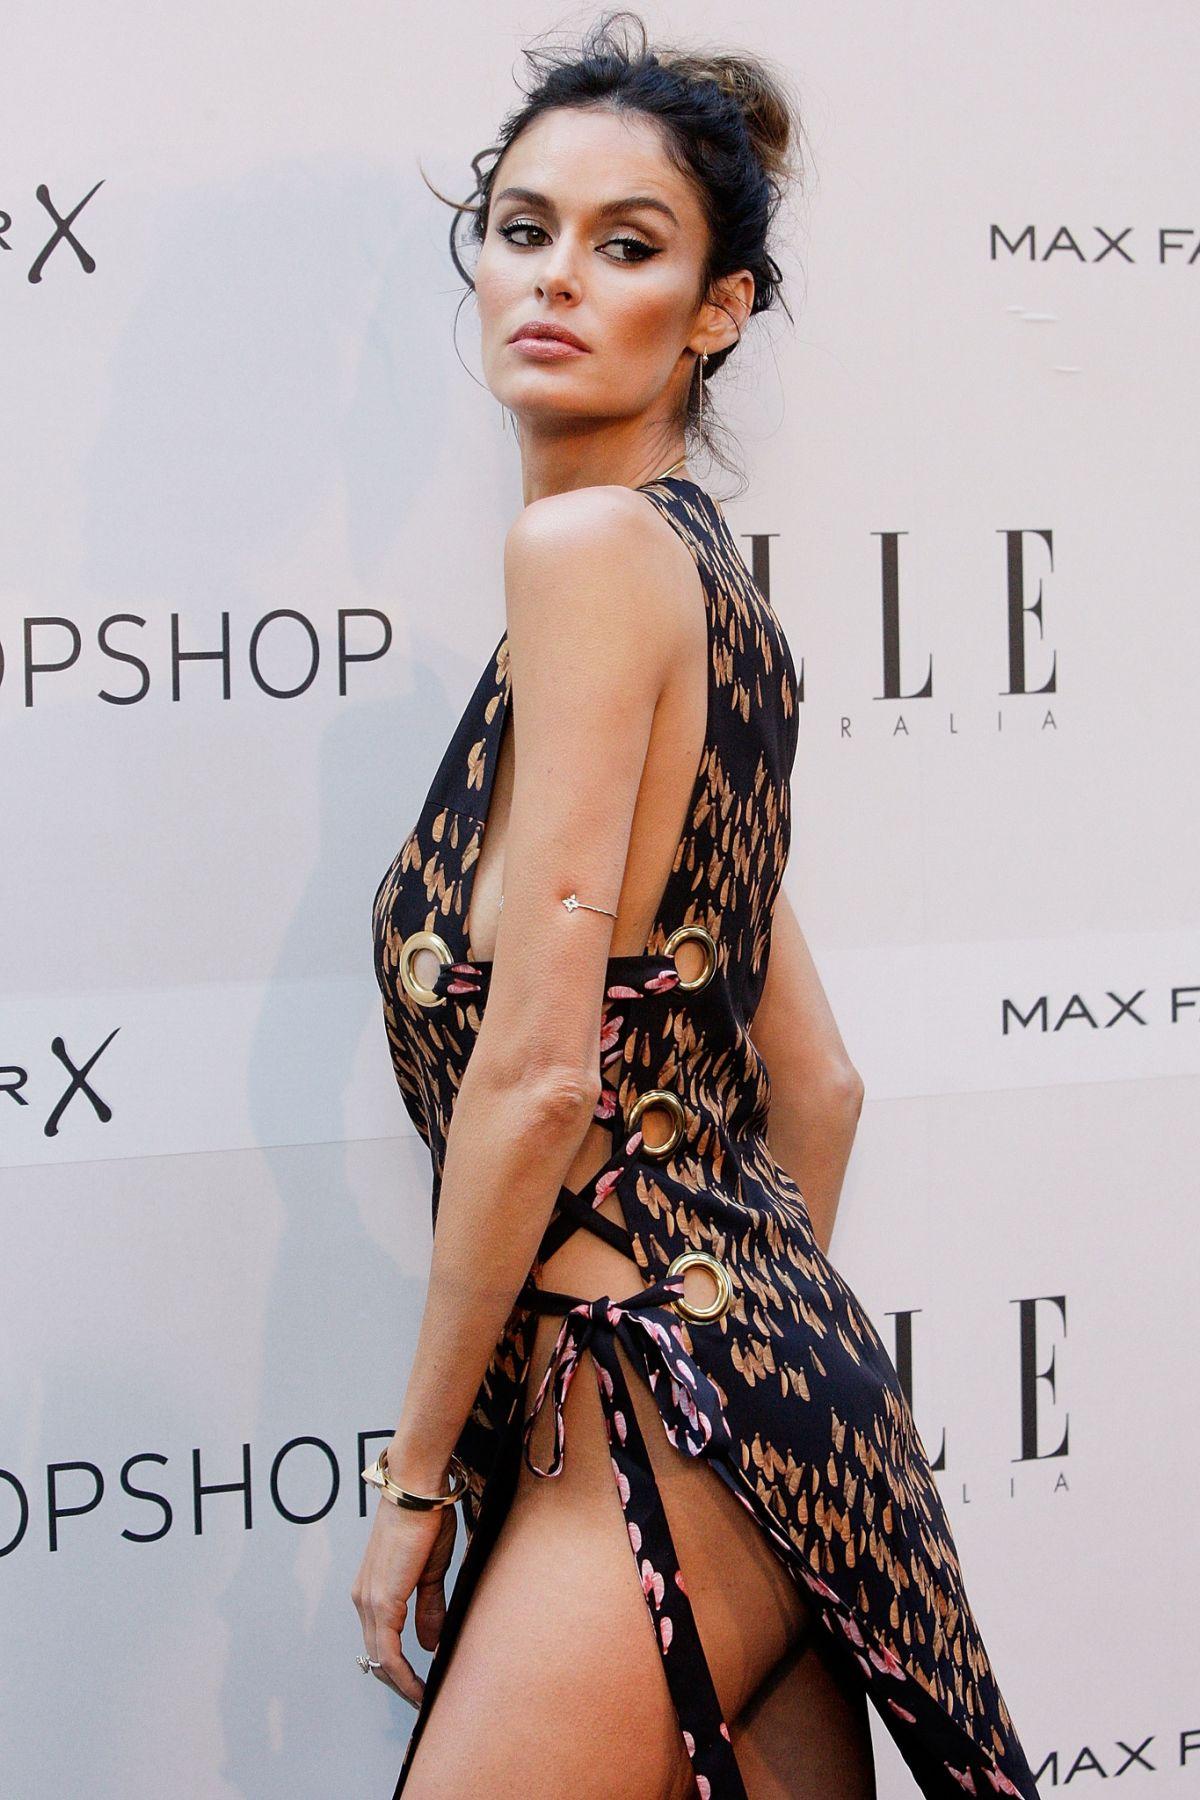 ICloud Nicole Trunfio nude (81 photos), Sexy, Paparazzi, Feet, butt 2015